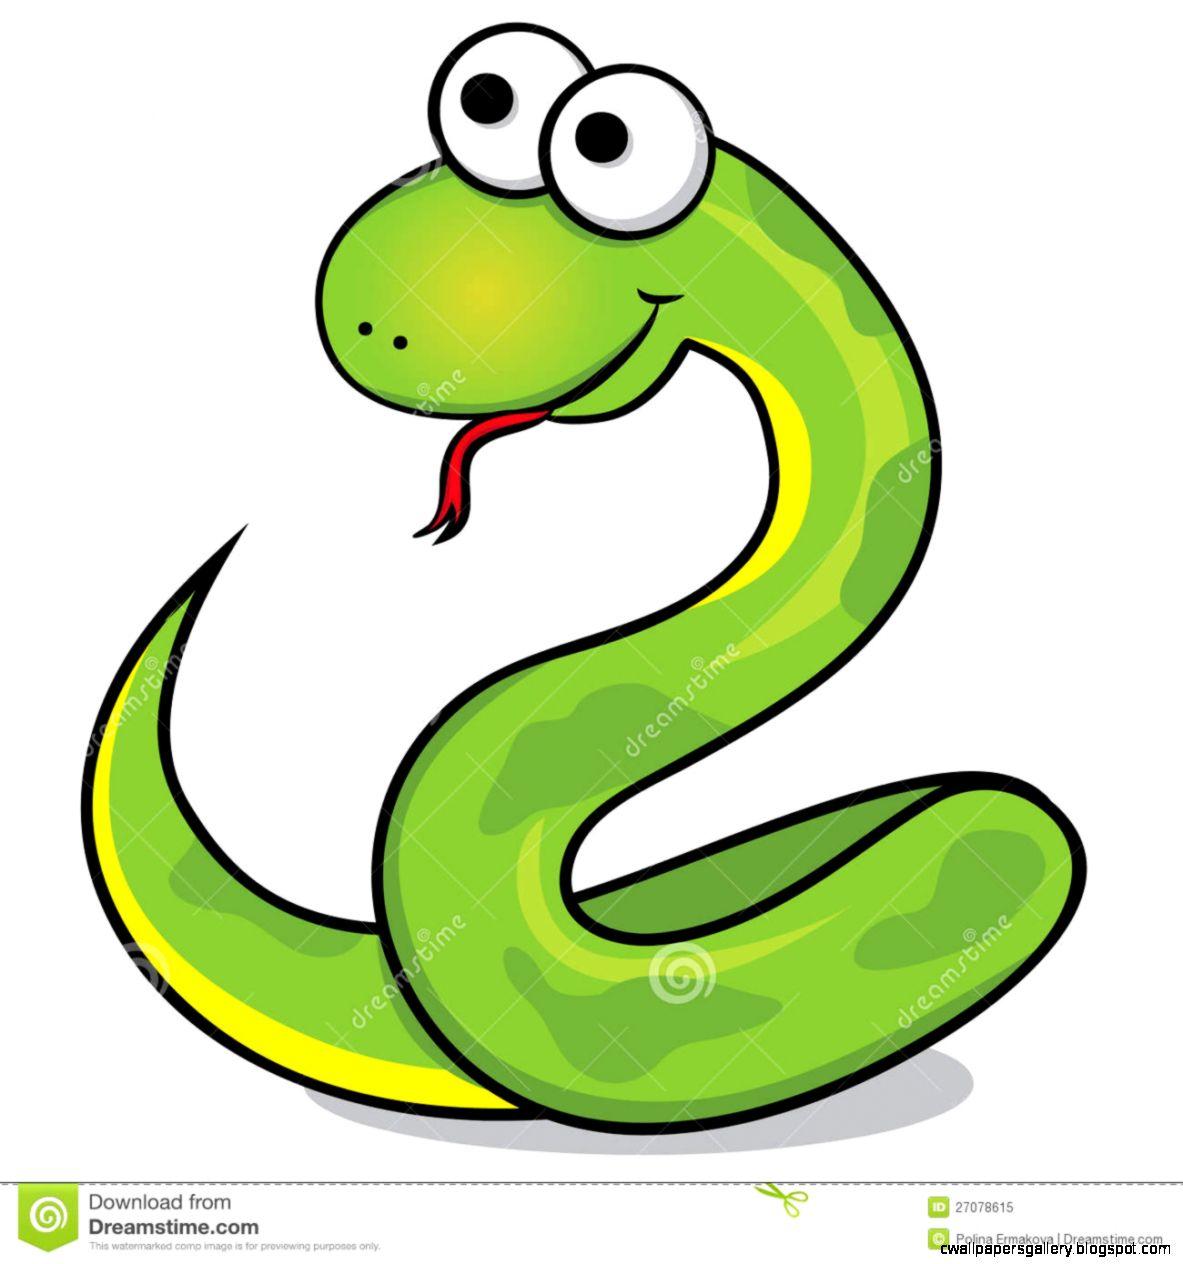 Snake clip art free download - Snake Clip Art